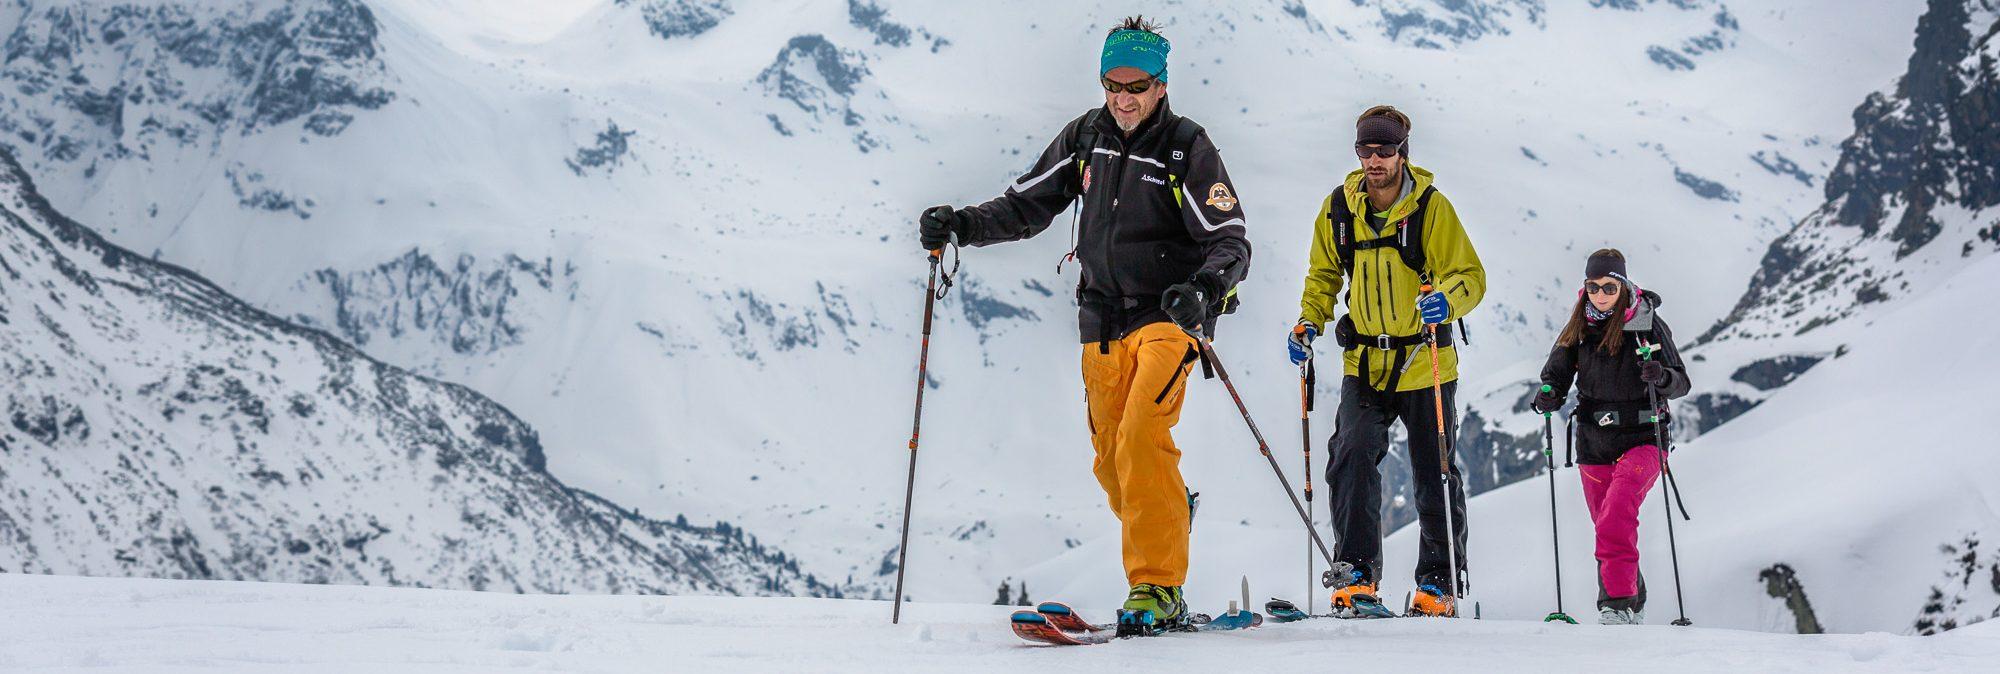 Diplom Skilehrer Montafon